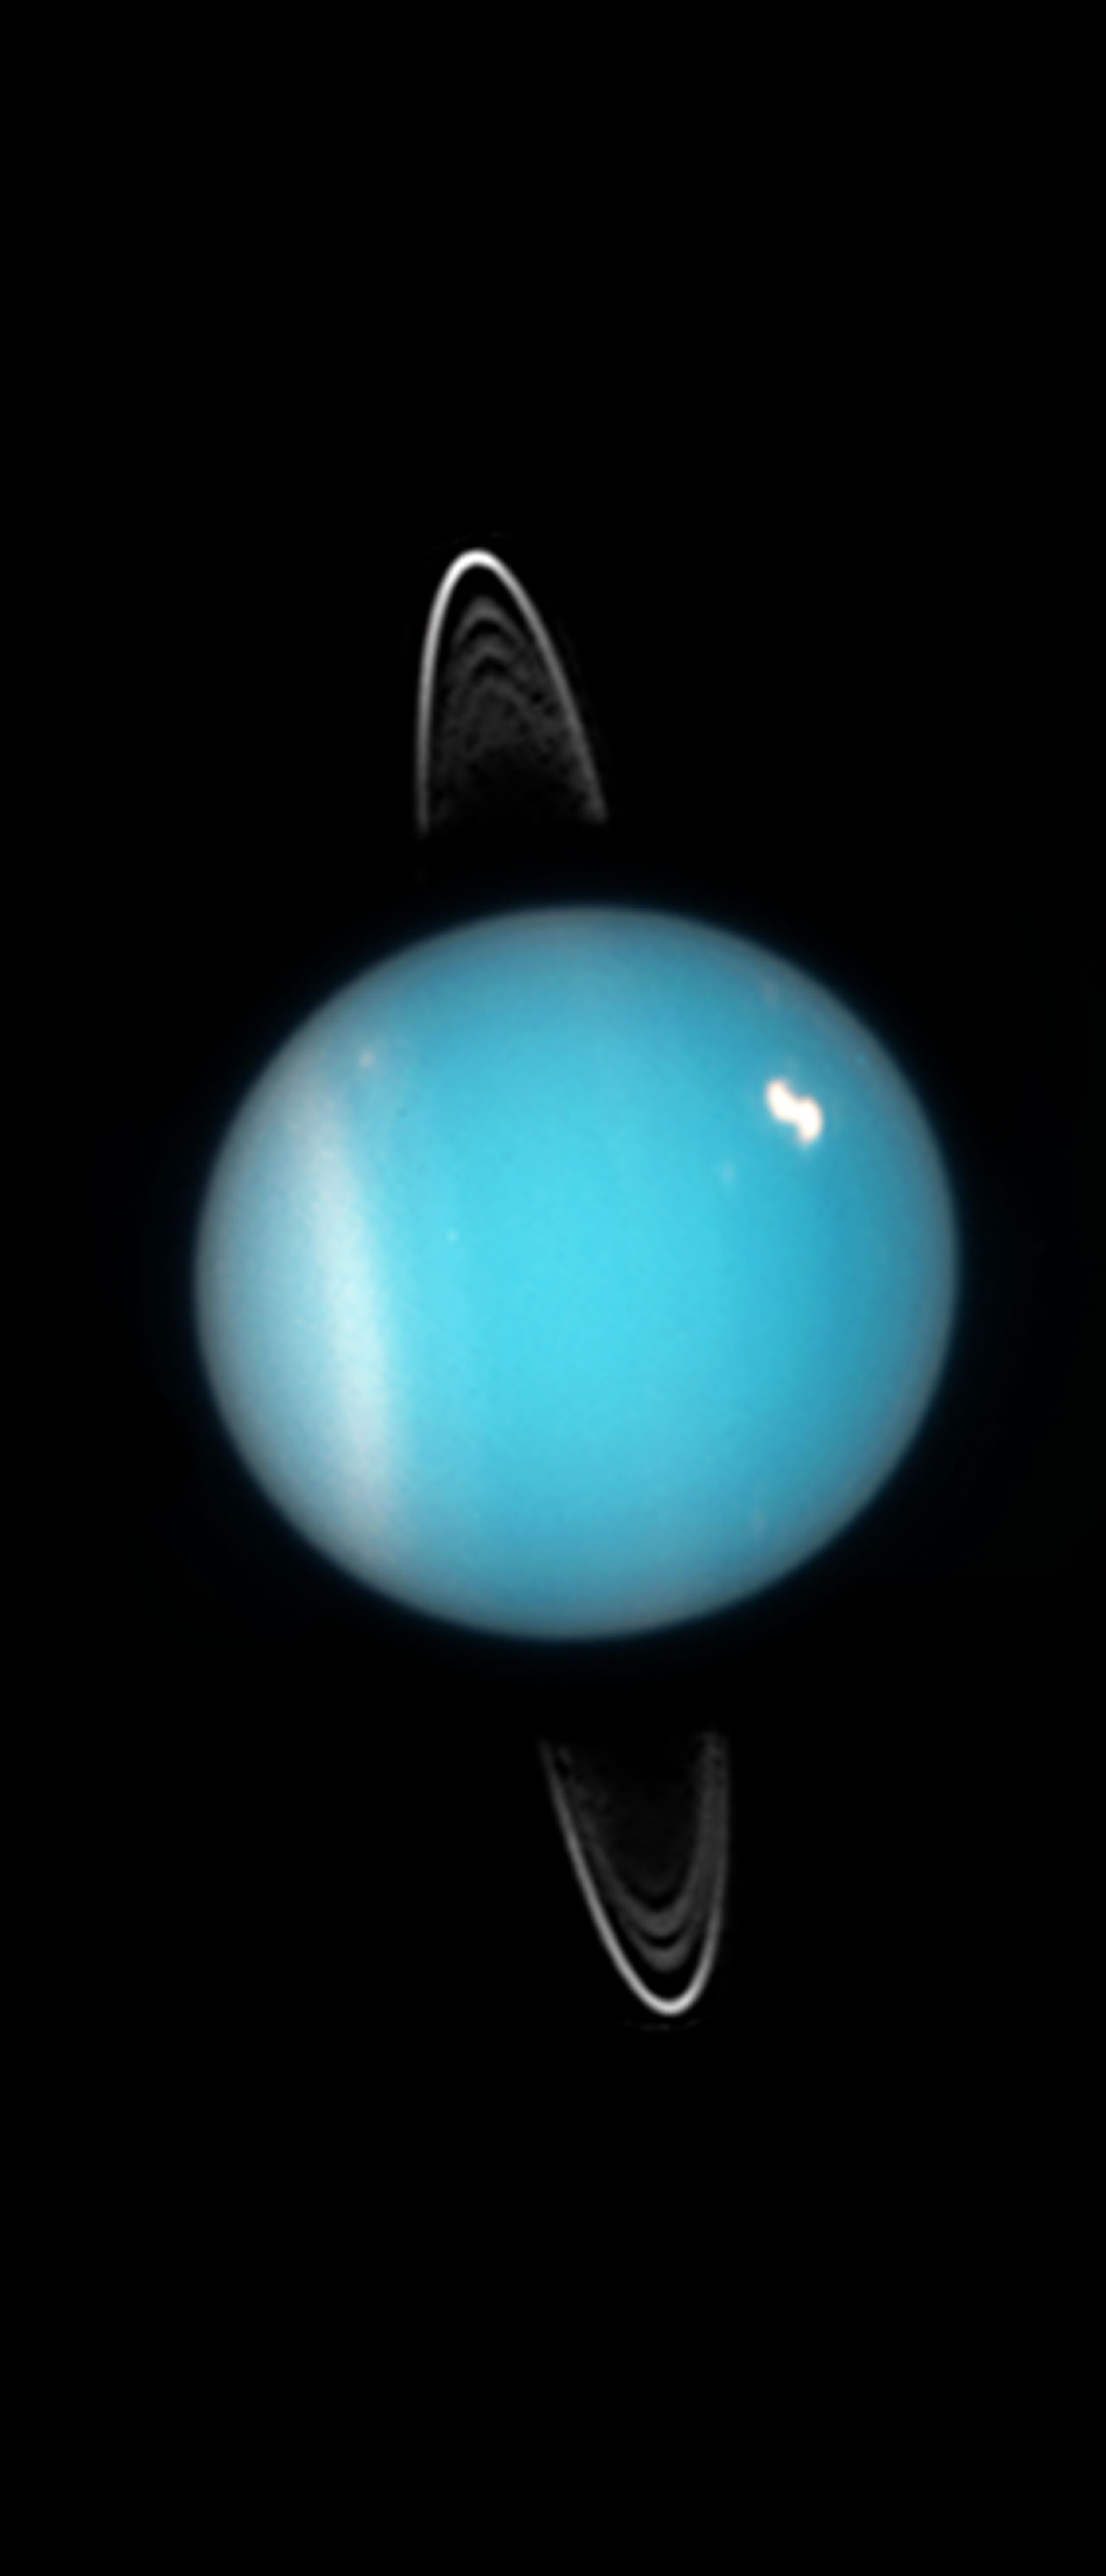 planet uranus rings - photo #37